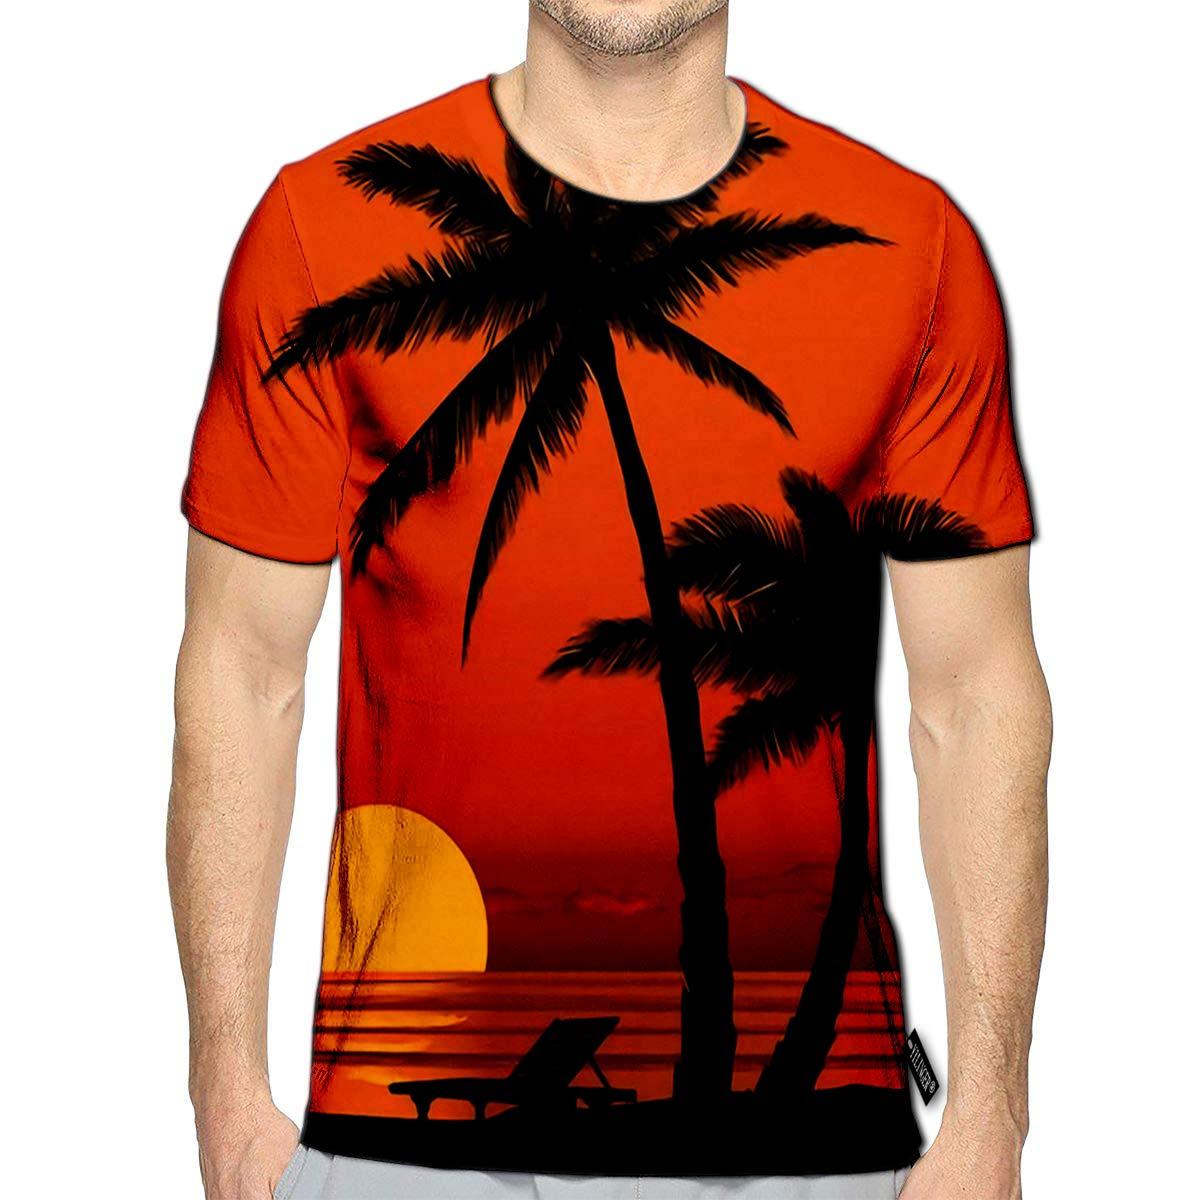 3D Printed T-Shirts Love Vintage Short Sleeve Tops Tees